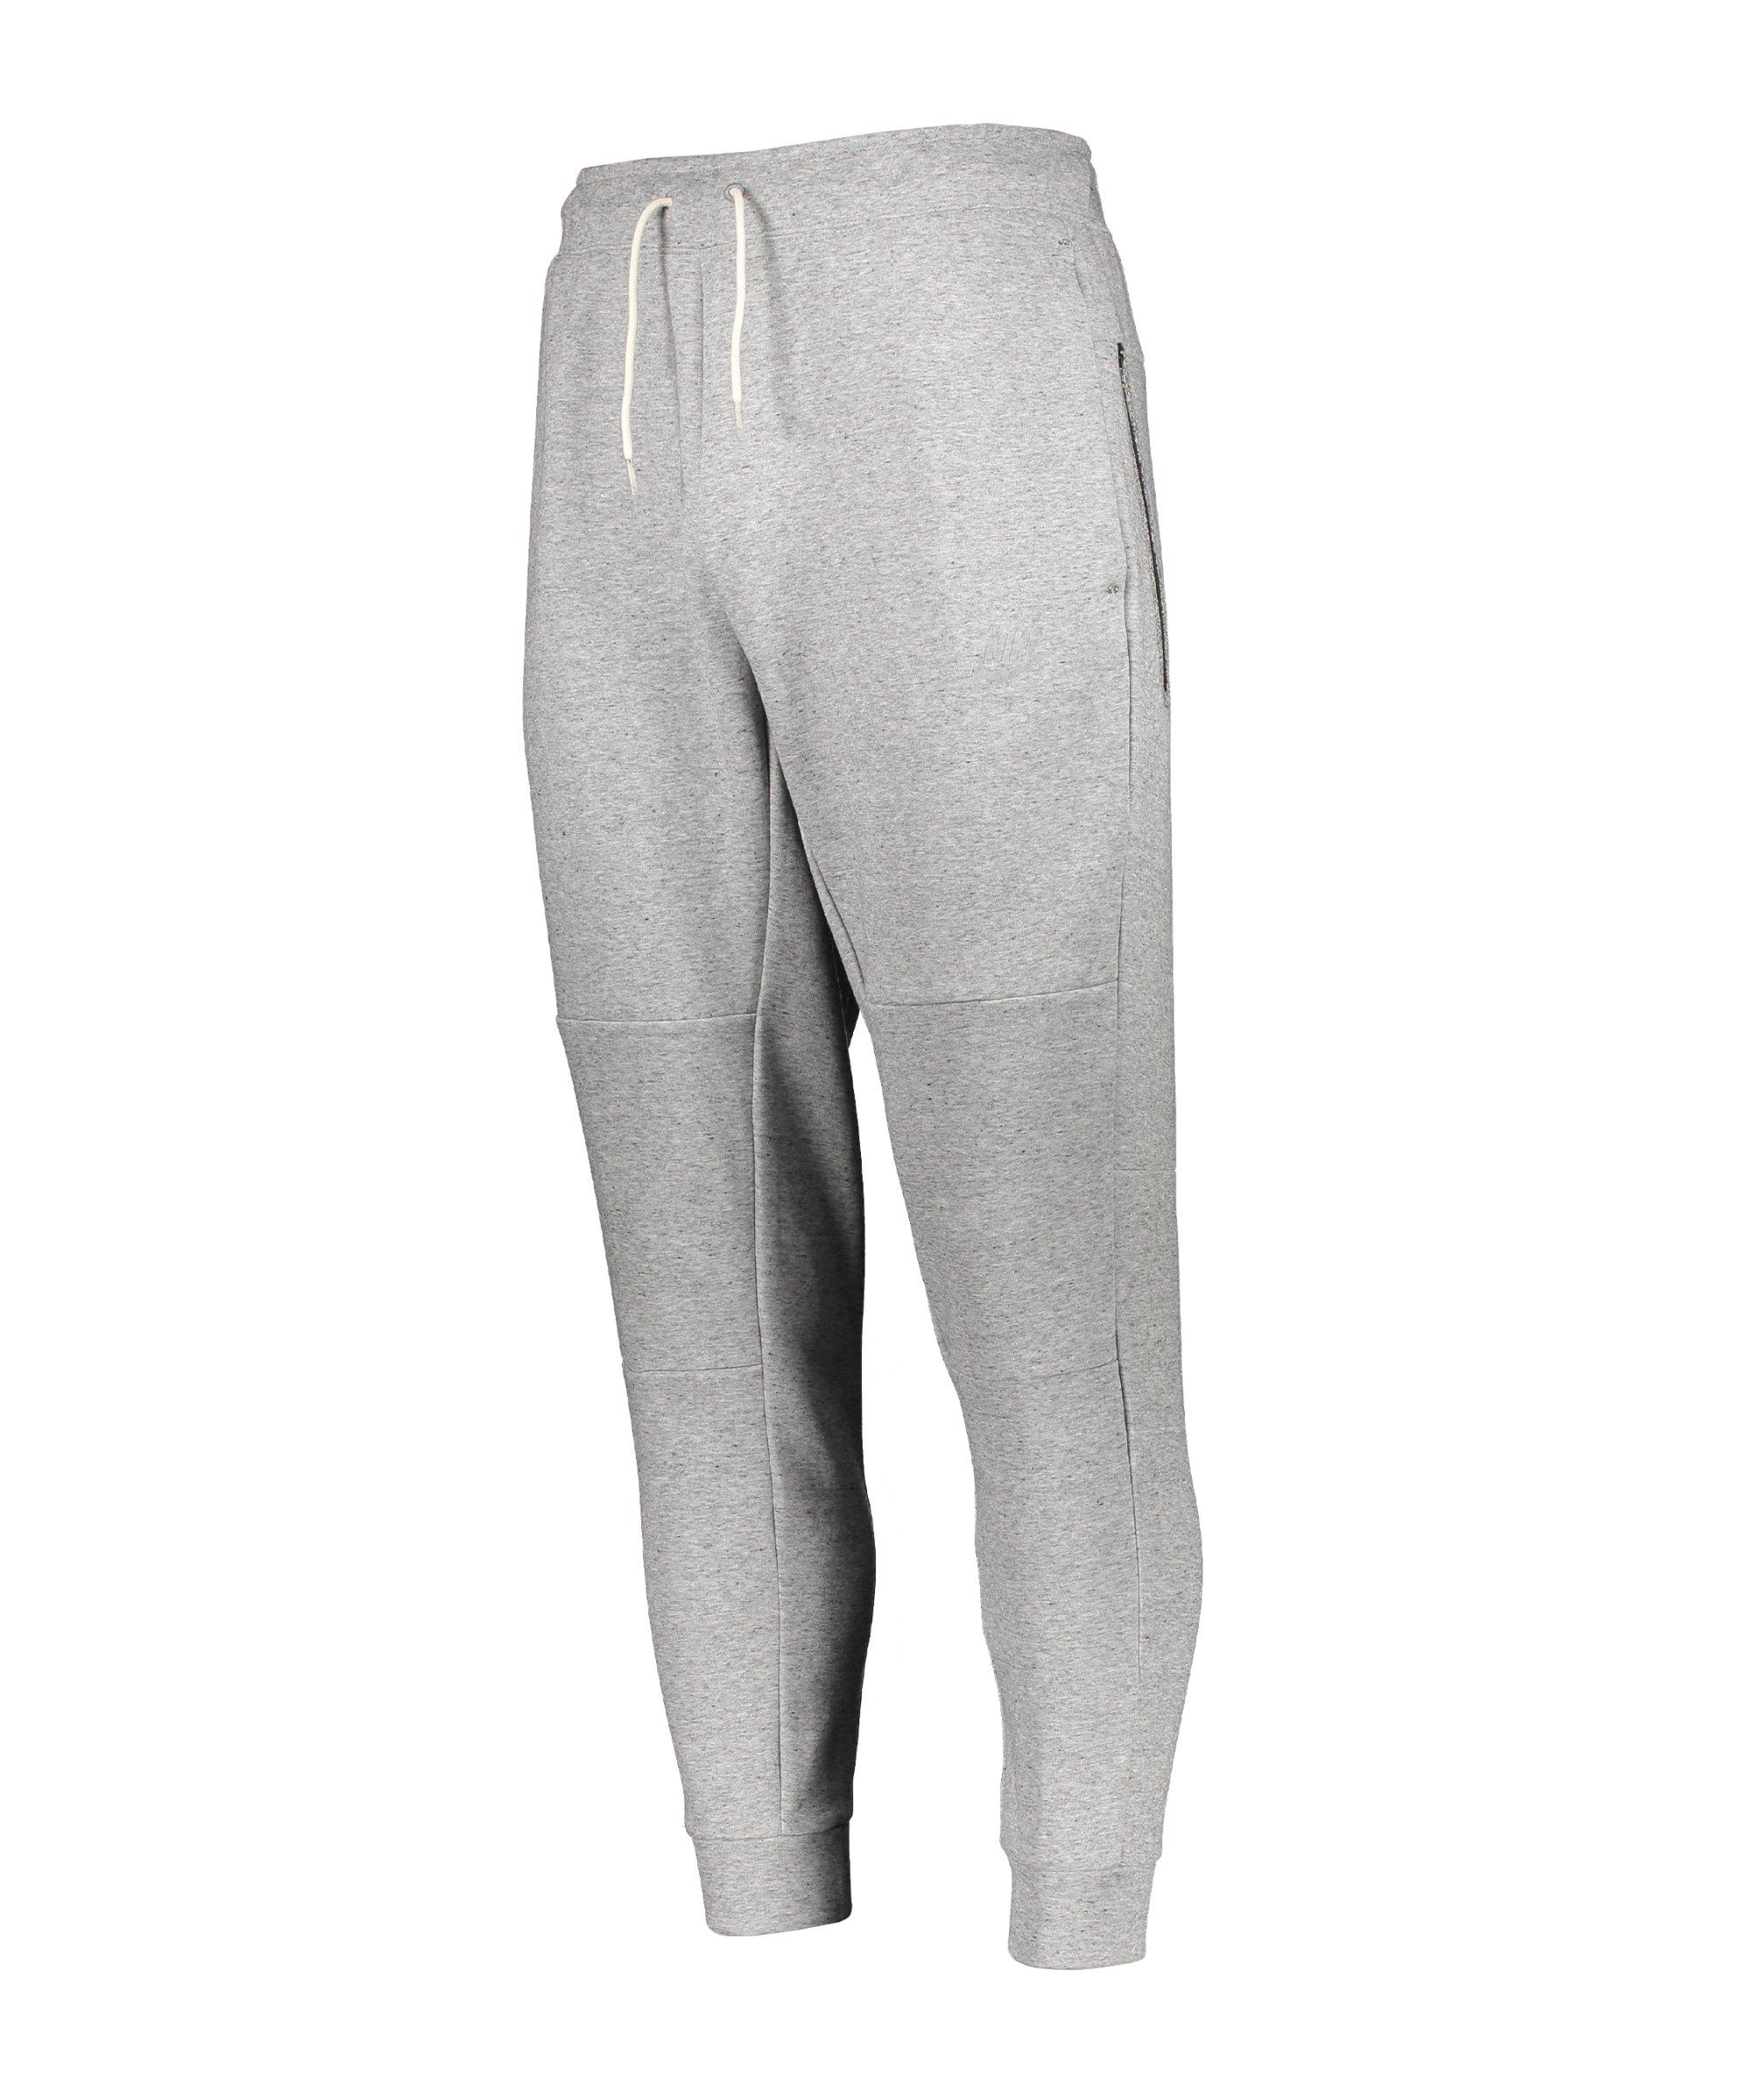 Nike Tech Fleece Revival Jogginghose Grau F010 - grau